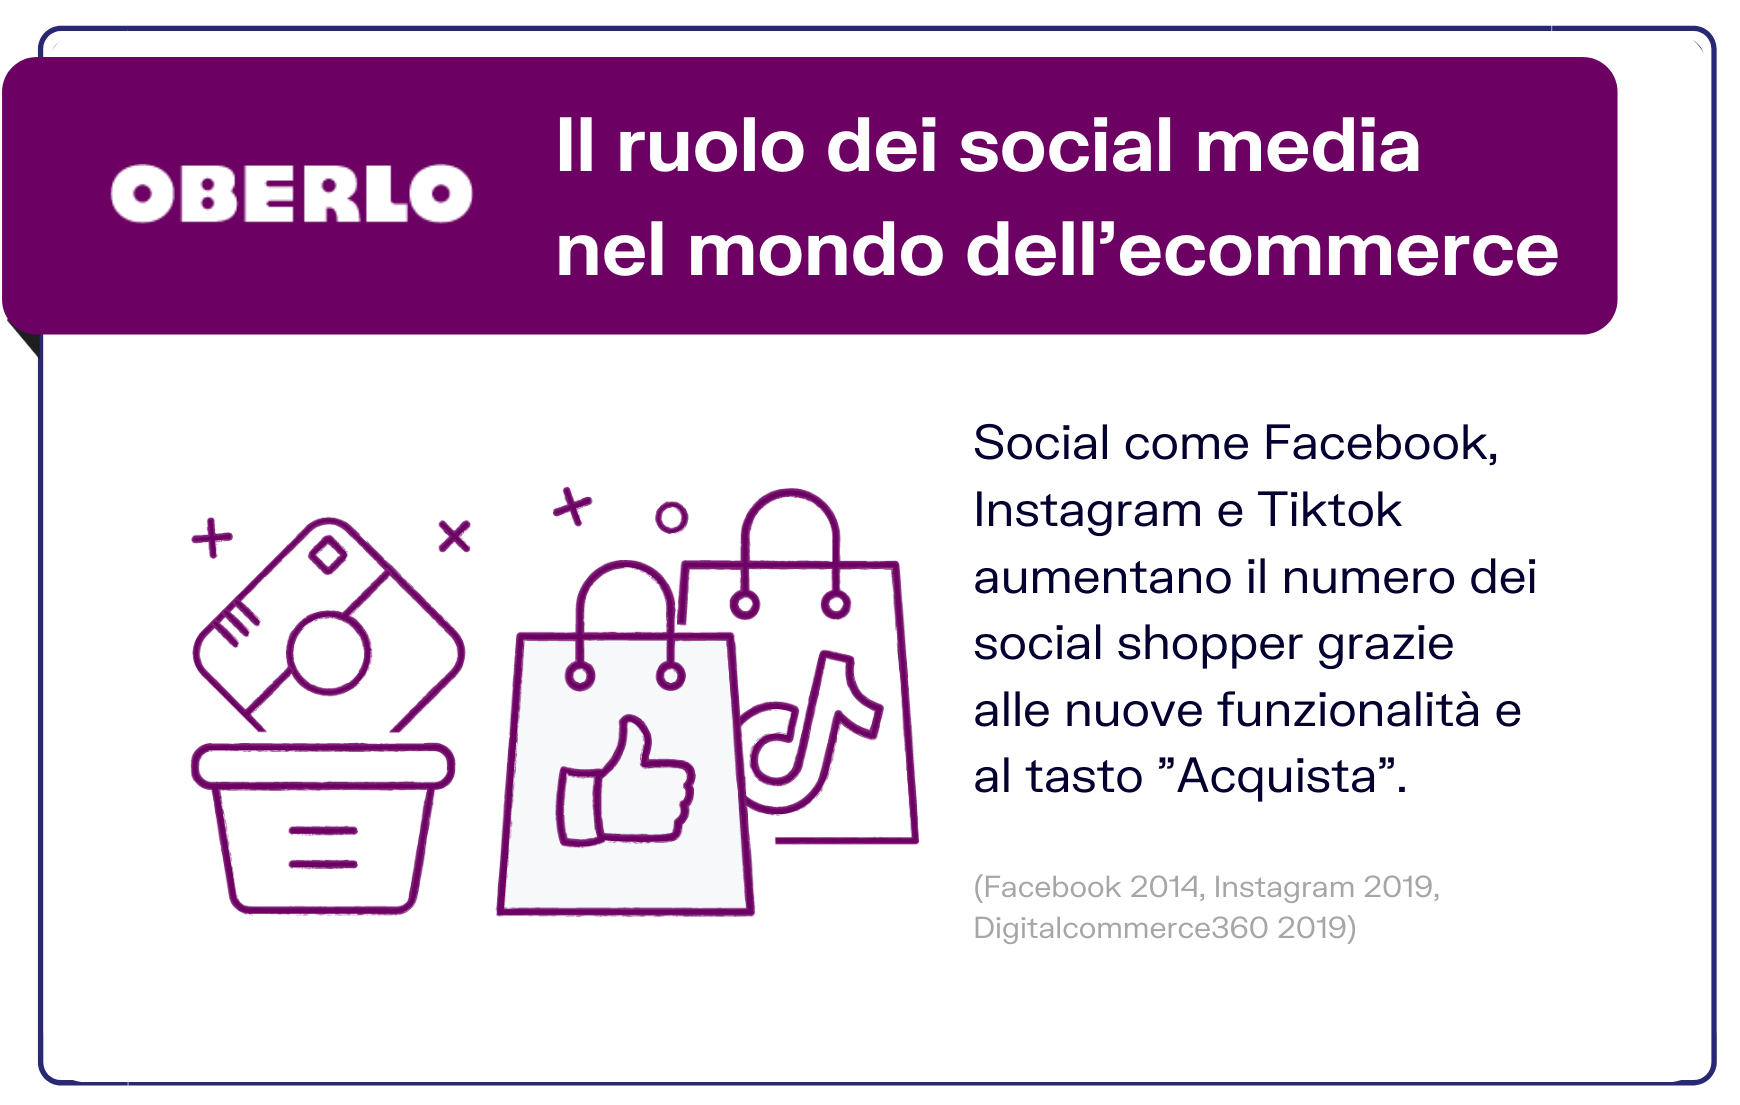 ruolo dei social media nell'ecommerce